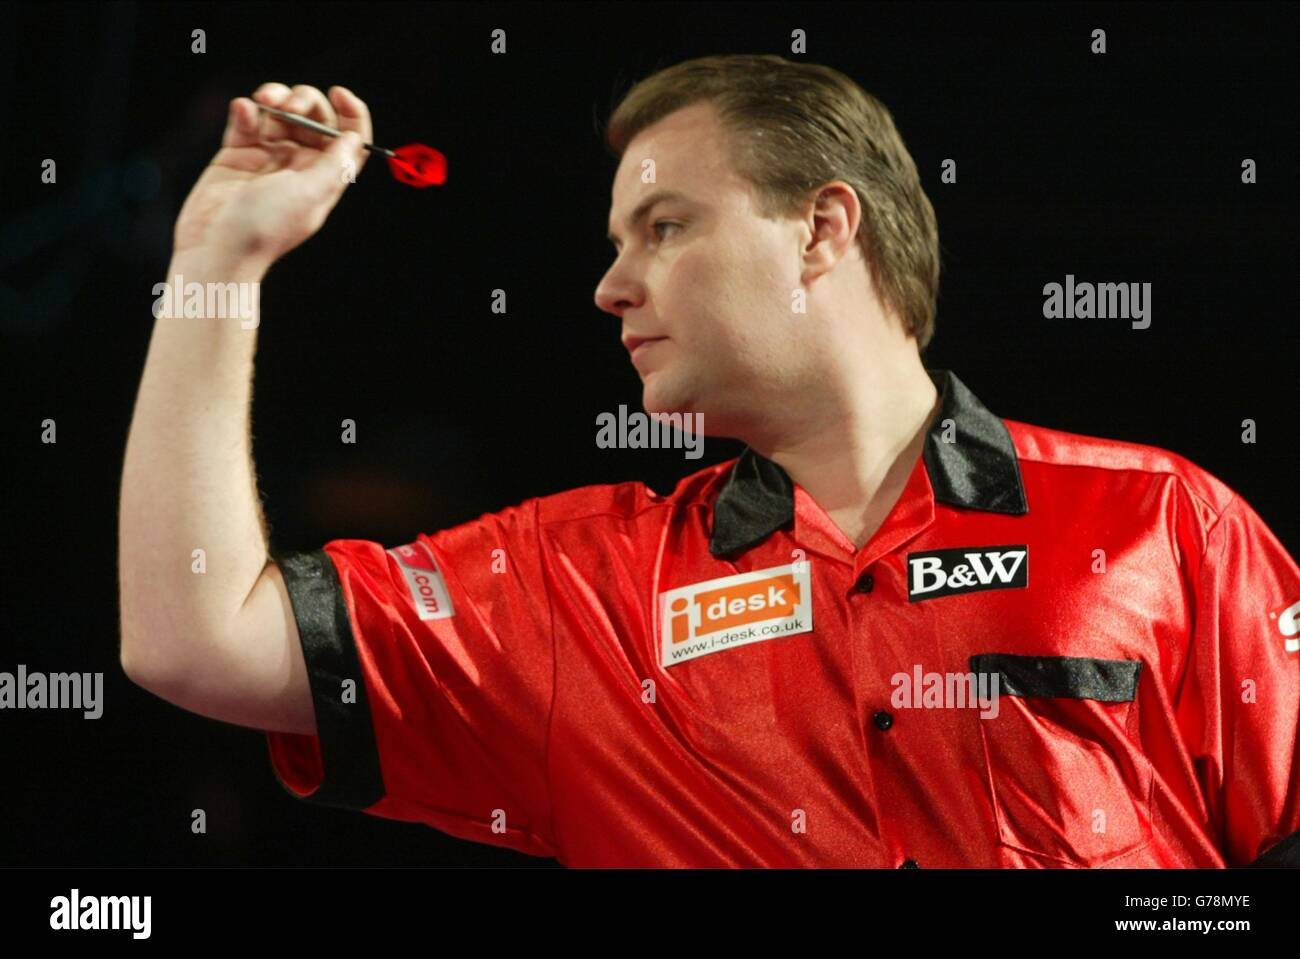 John Part World Darts Stock Photo - Alamy